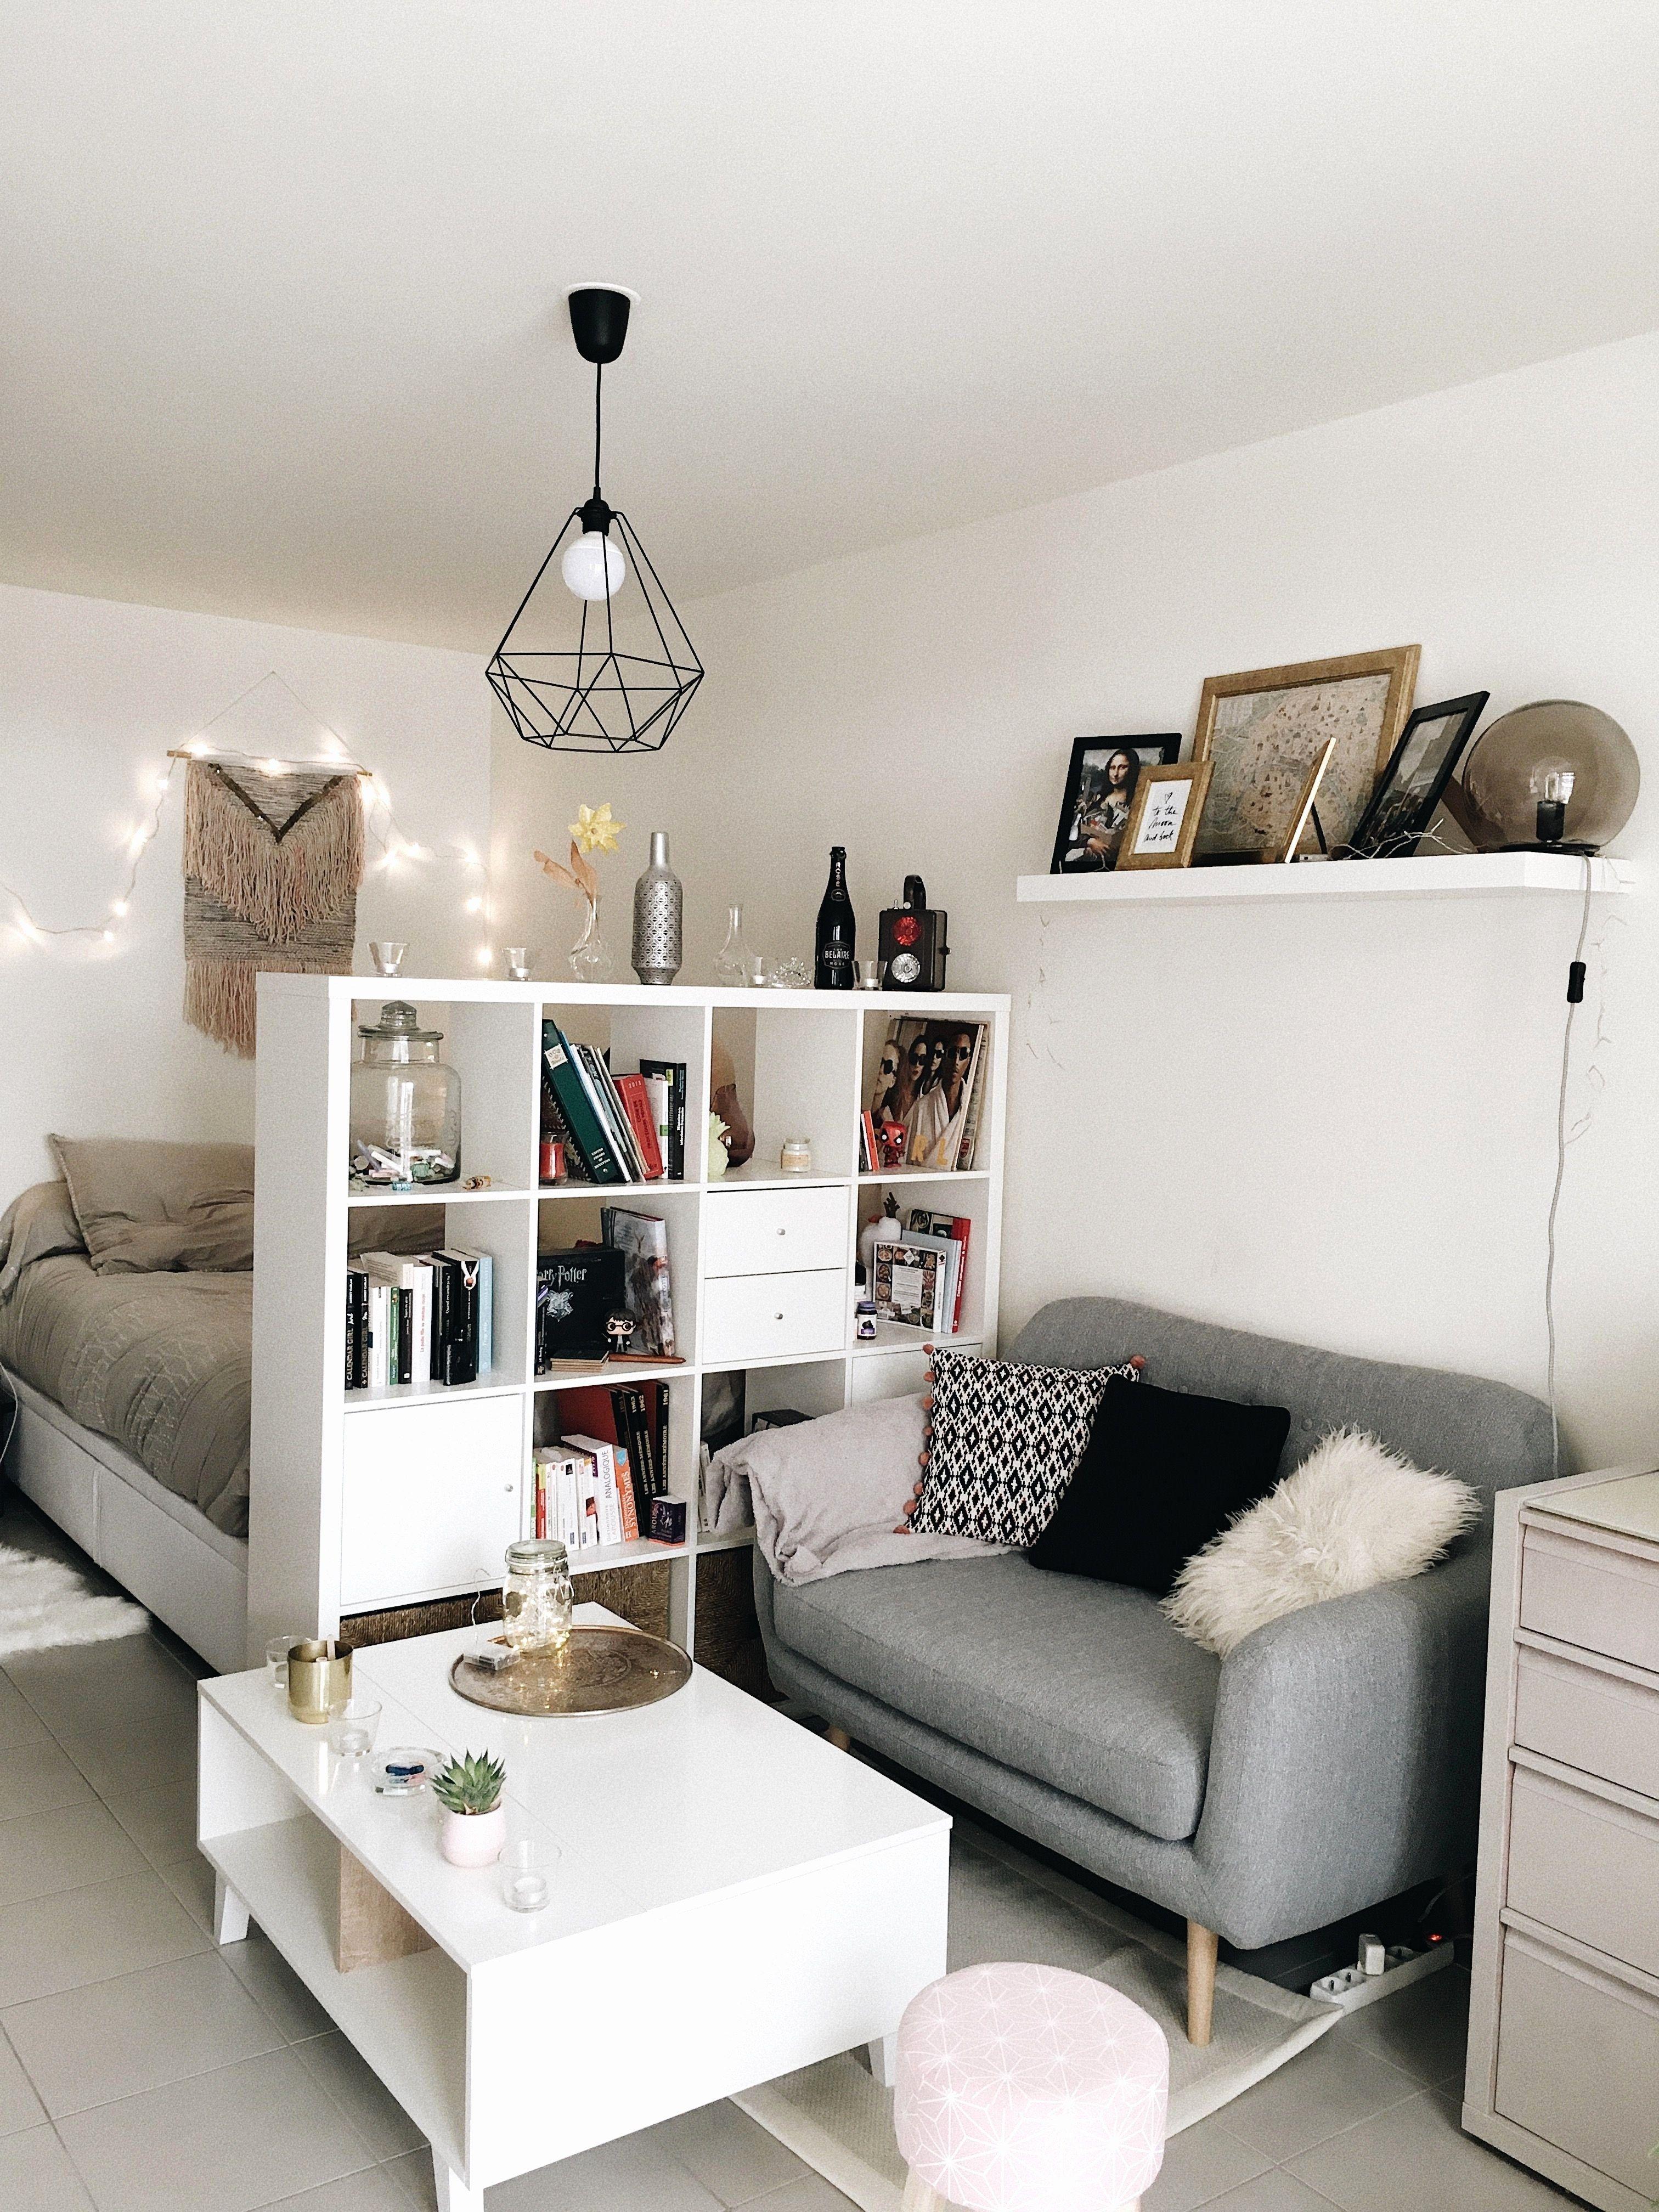 Amenager Studio 15m2 Avec Images Deco Appartement Deco Petit Appartement Decoration Petit Appartement